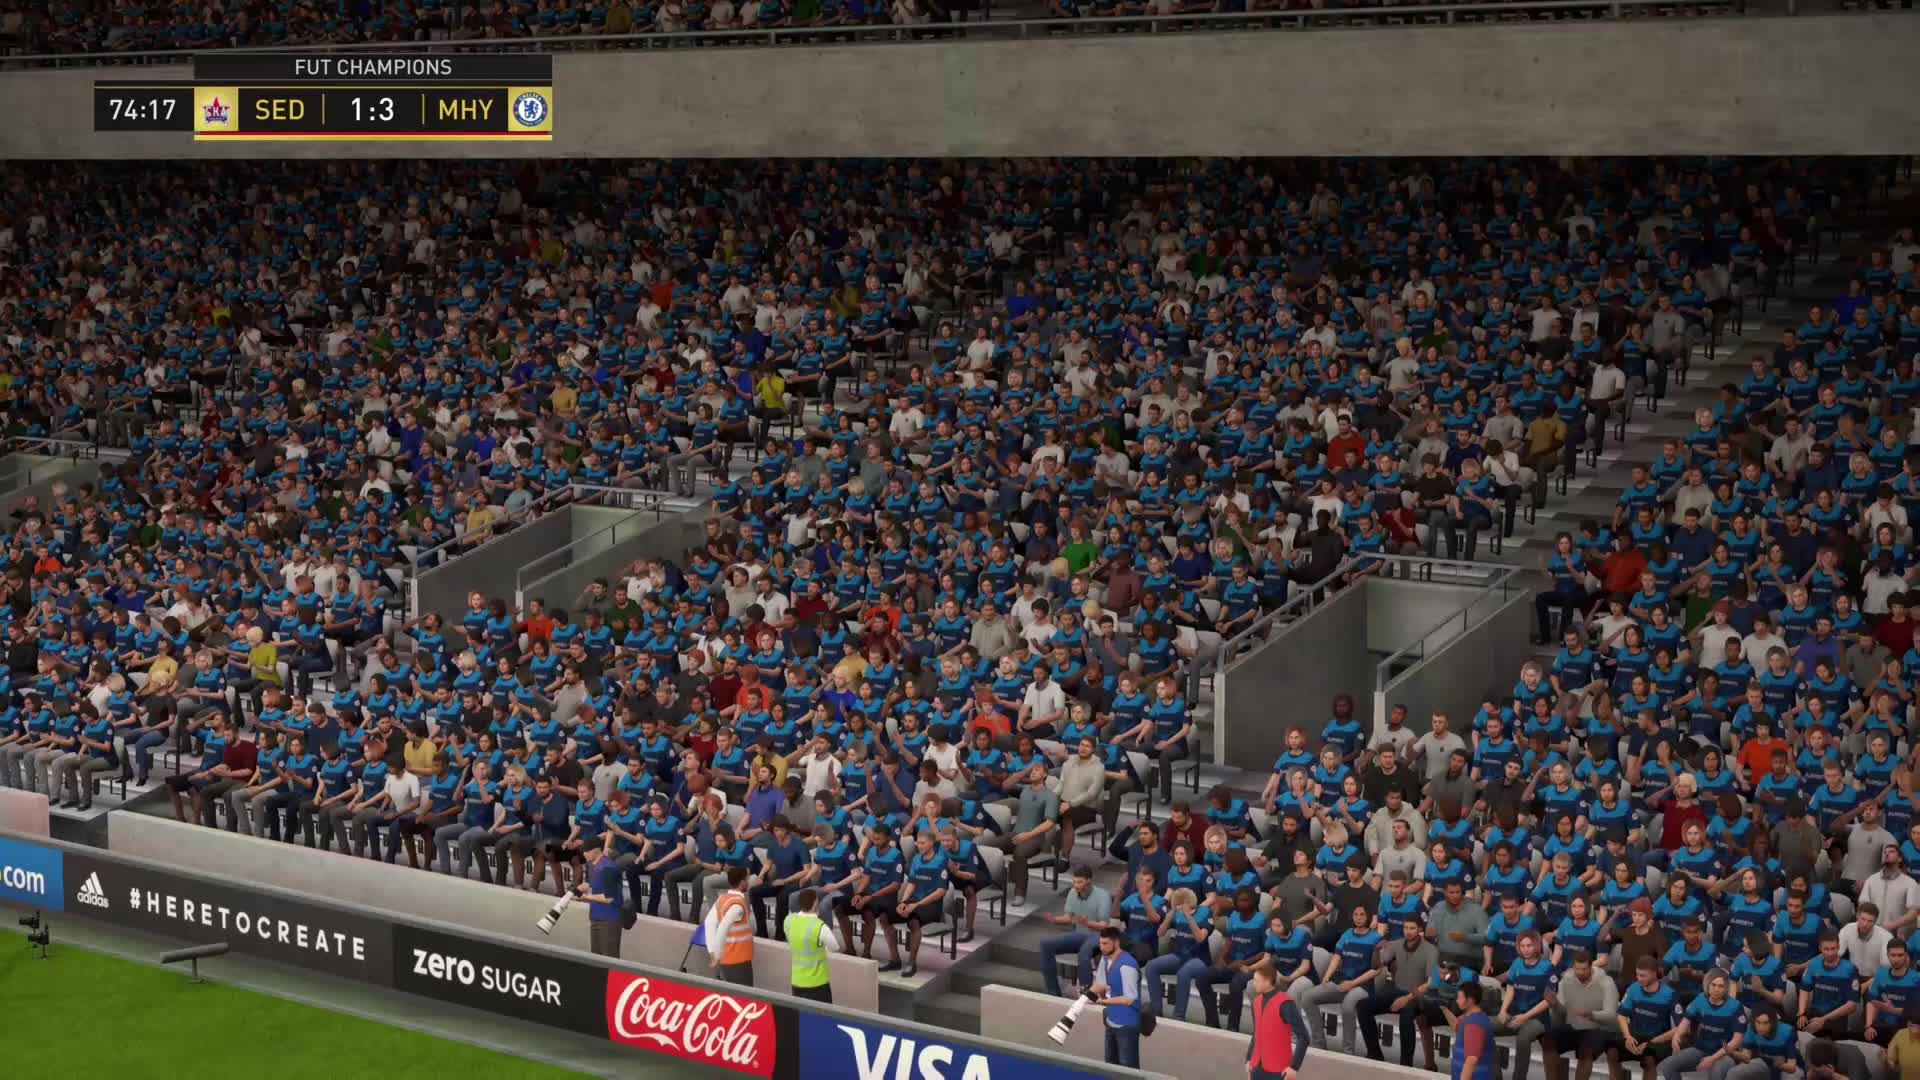 BubbleBathDan, FIFA18, xbox, xbox dvr, xbox one, Fifa GIFs